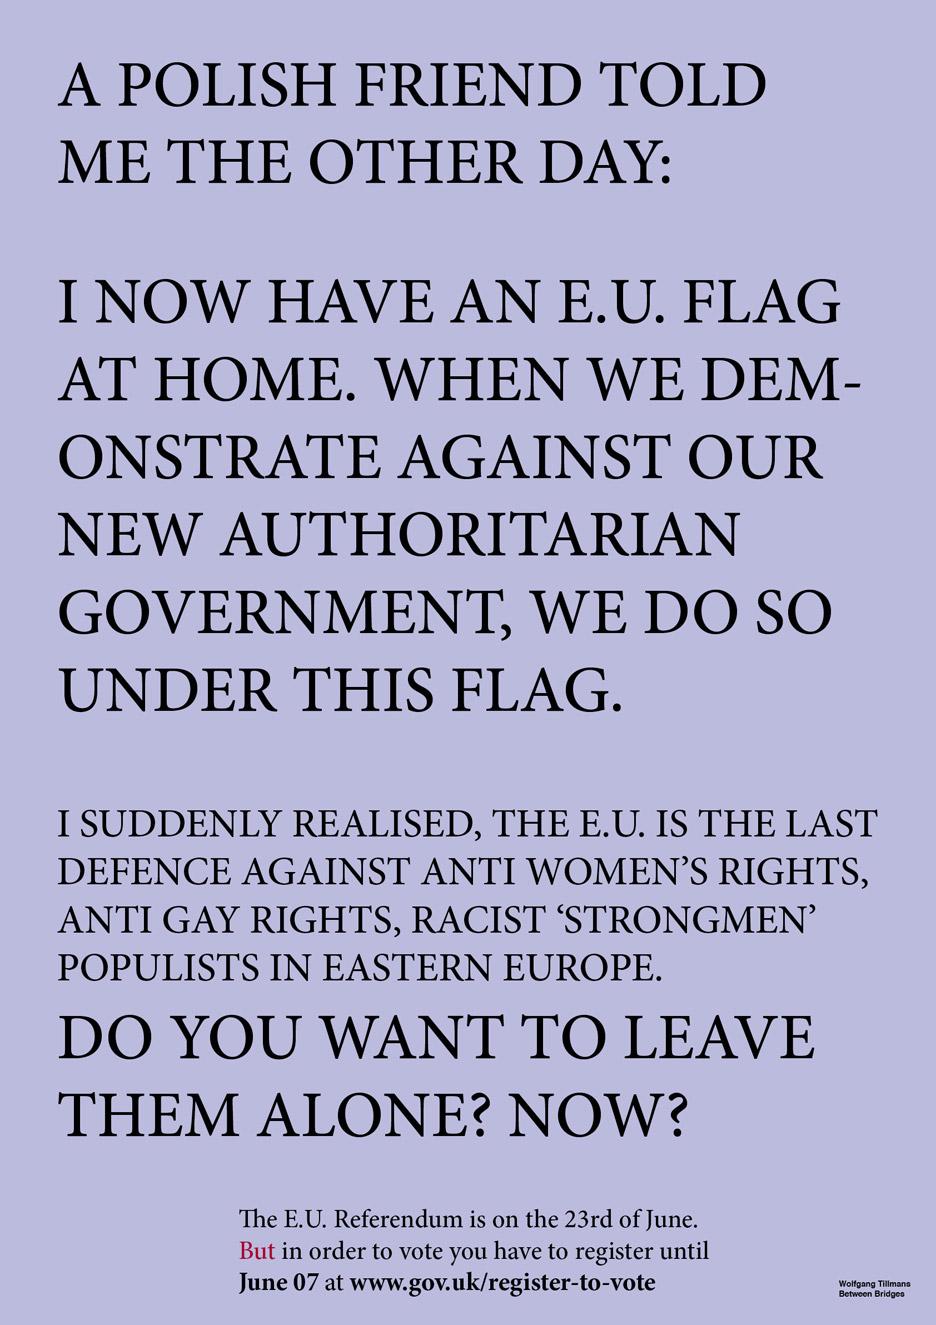 eu-referendum-remain-campaign-posters-by-wolfgang-tillmans_dezeen_936_4